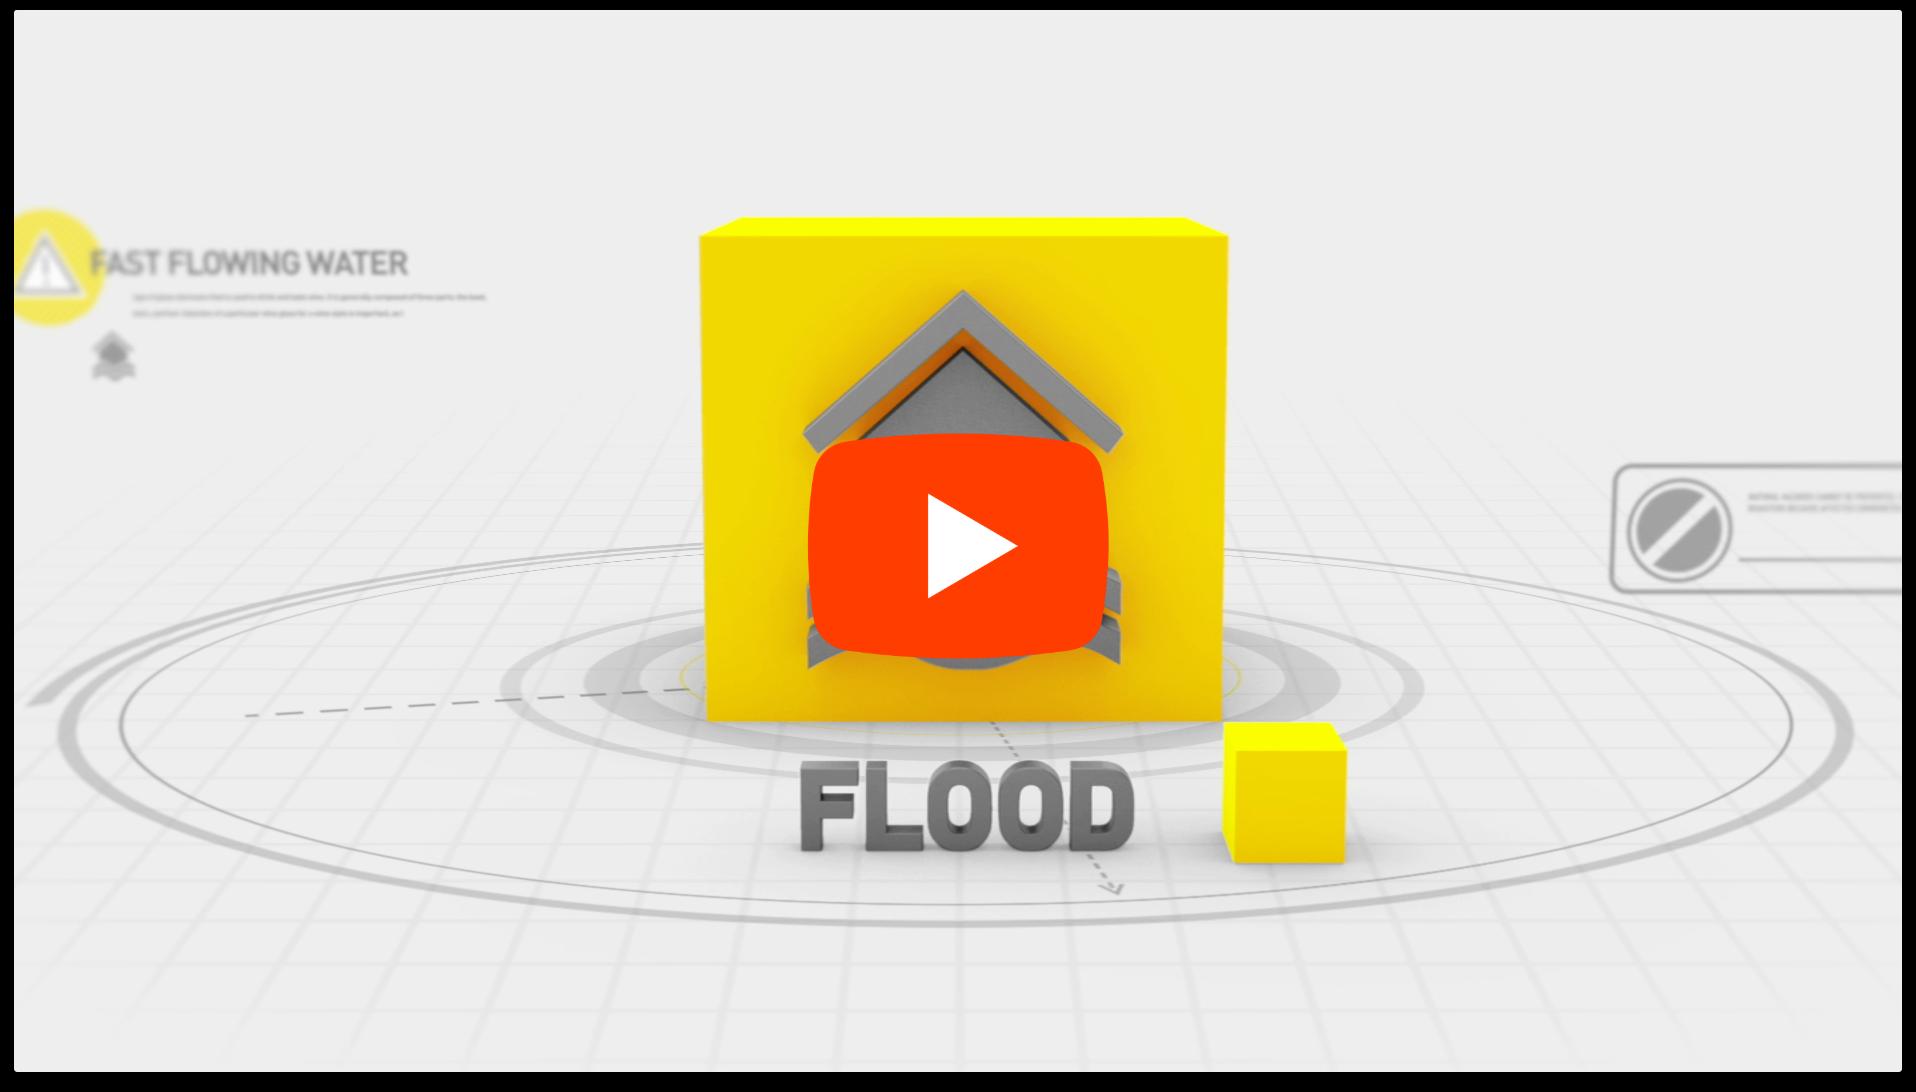 <p>Flood</p>